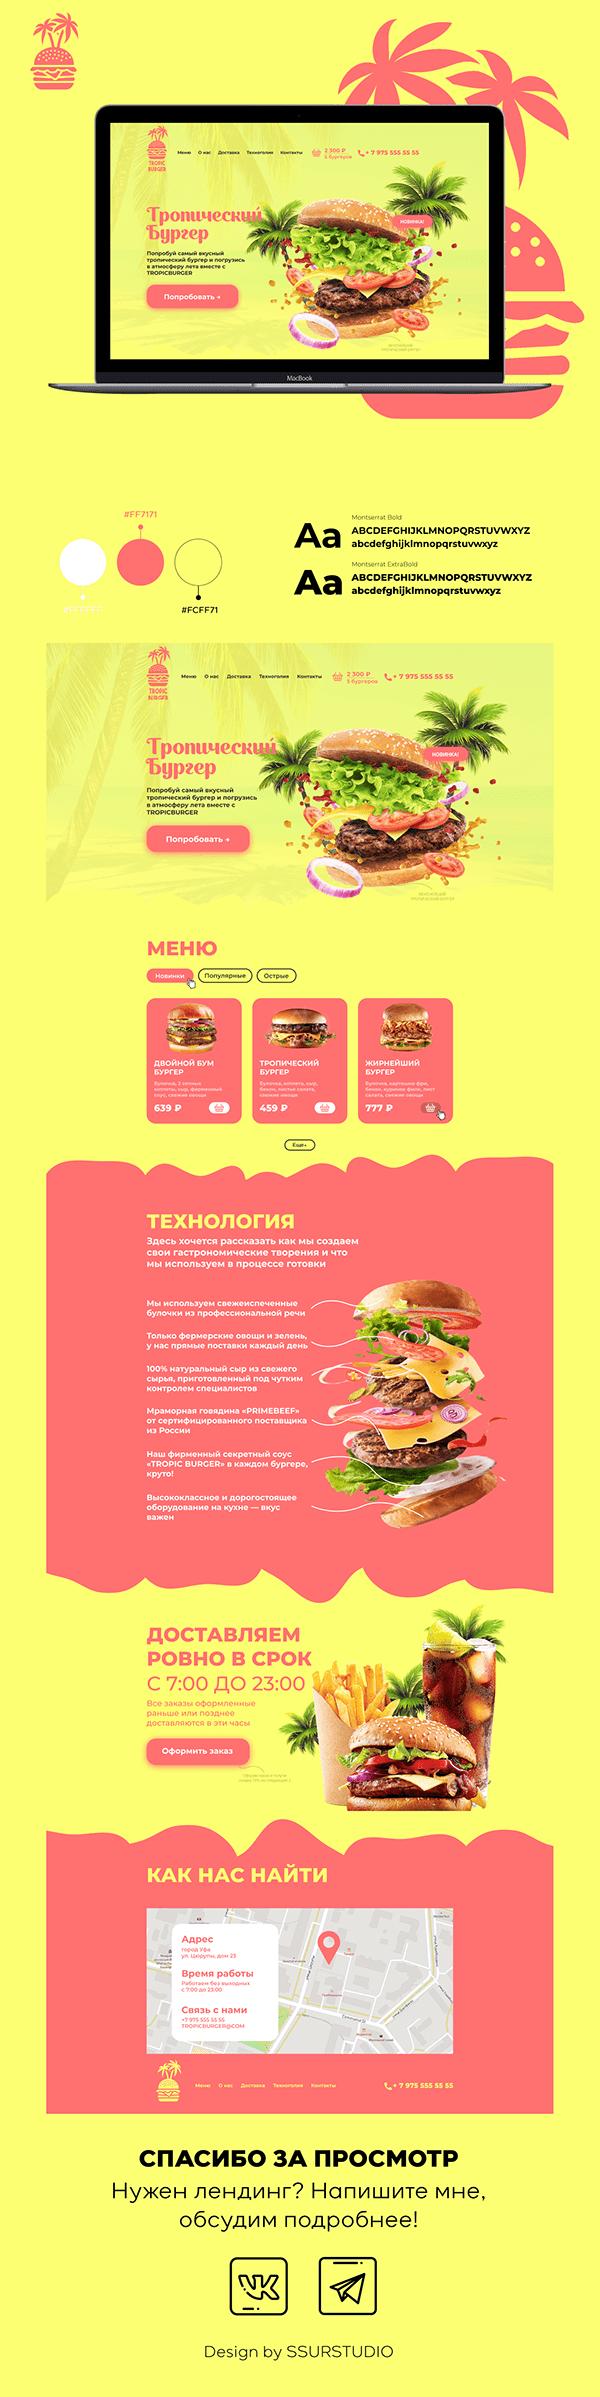 TROPIC BURGER – fast food restaurant (landing page)